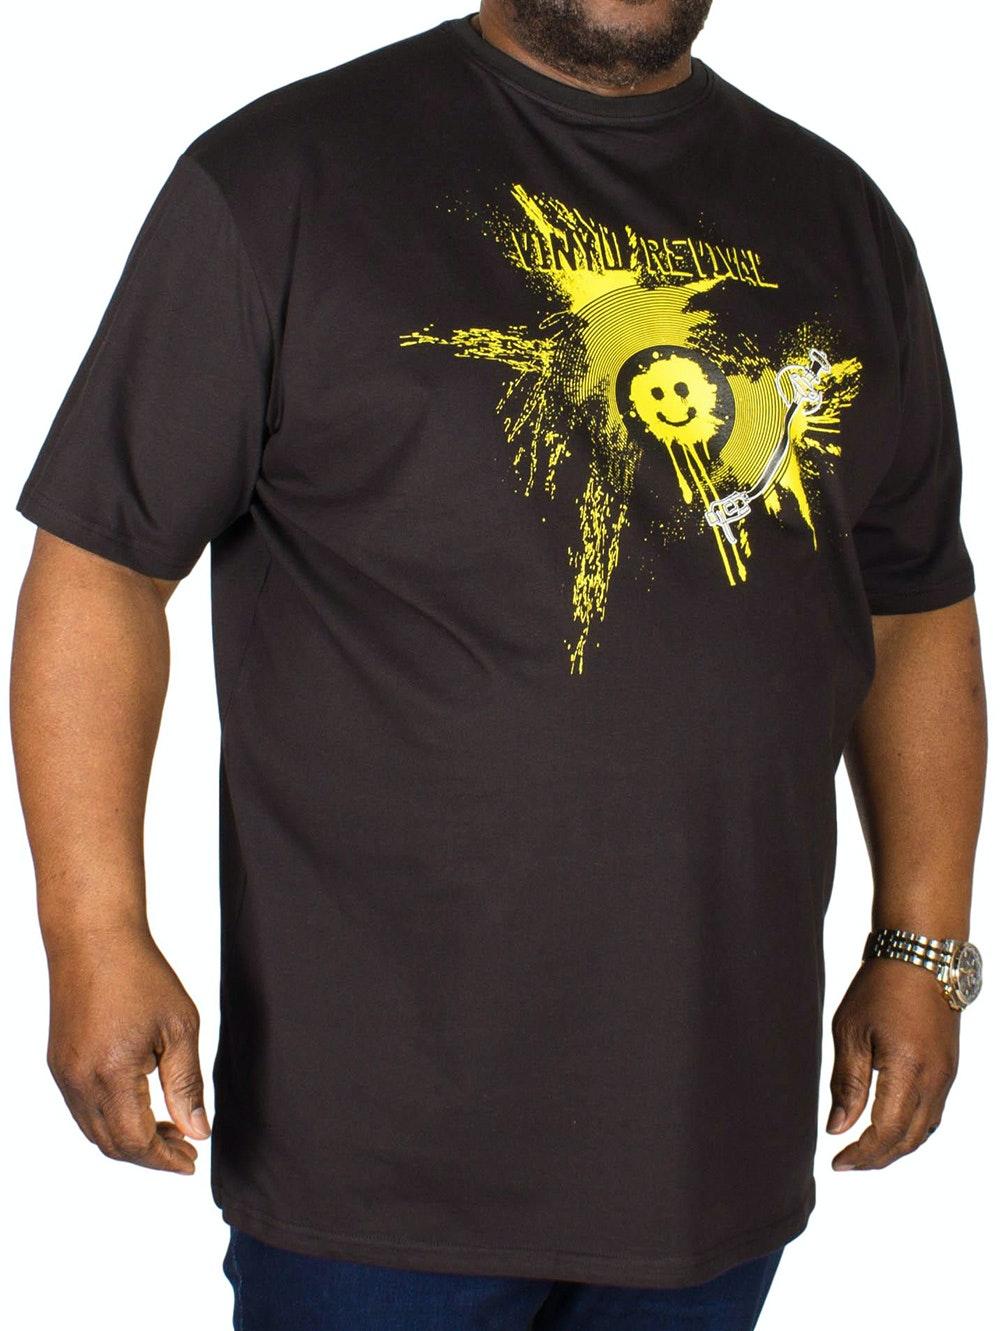 Metaphor Vinyl Revival Print T-Shirt Black